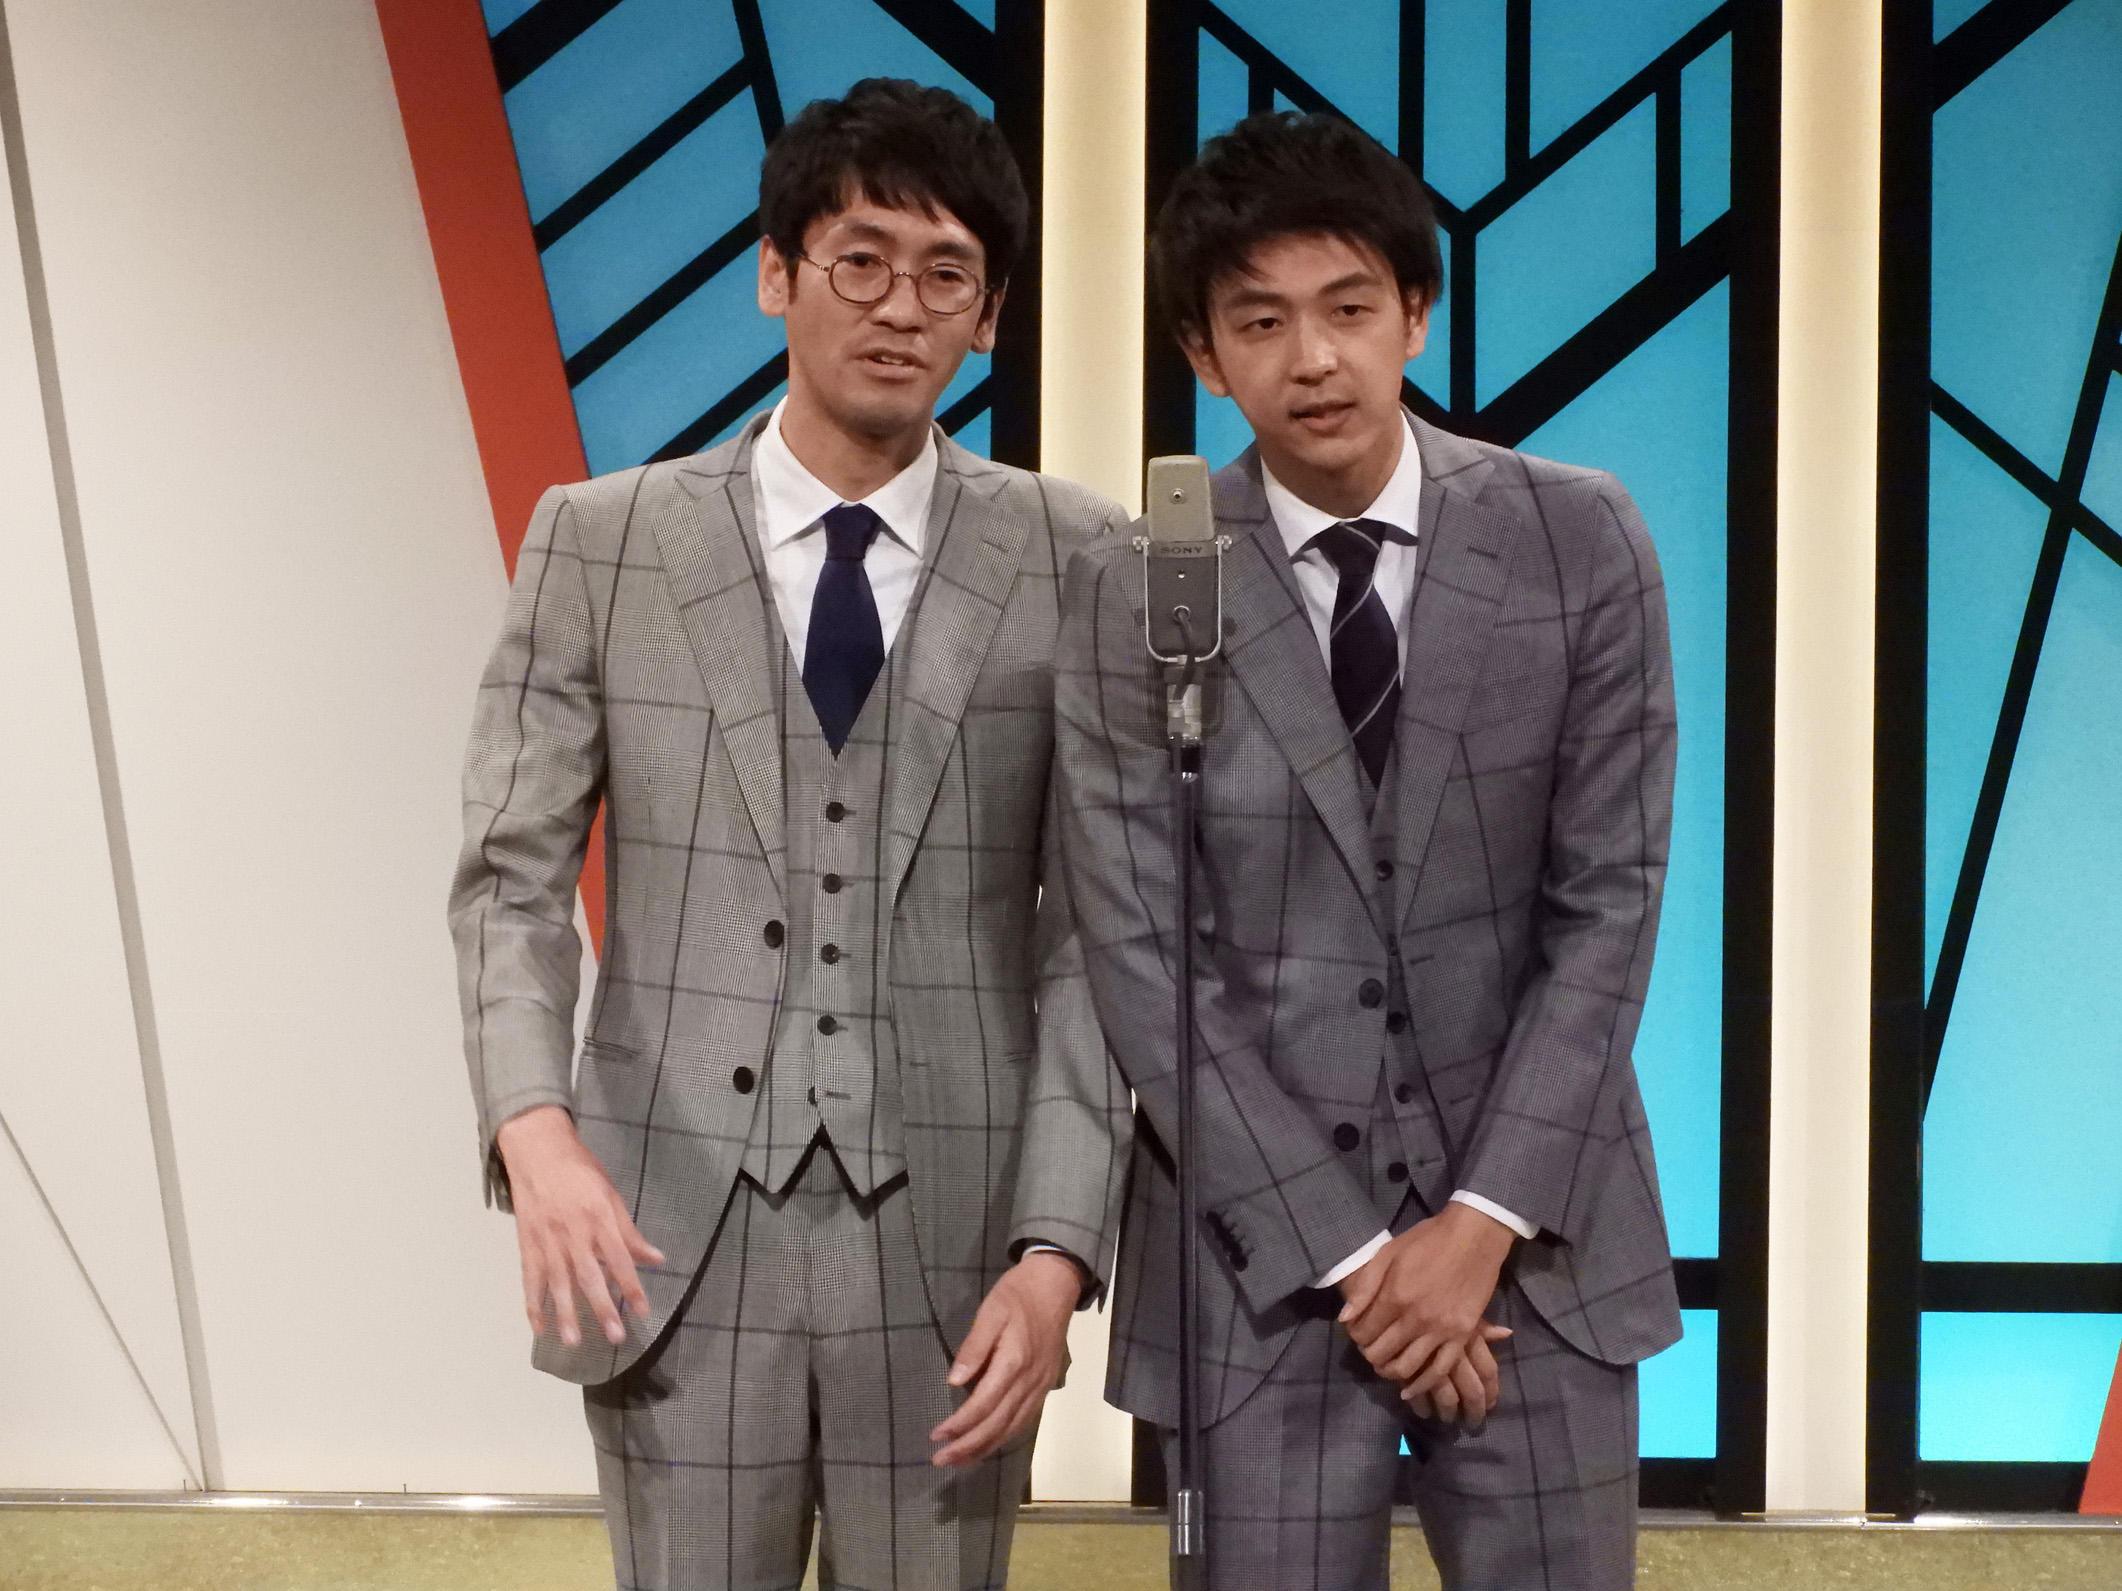 http://news.yoshimoto.co.jp/20181105124423-17325af9ed9eabecdcc706e678a74d33234ded7f.jpg